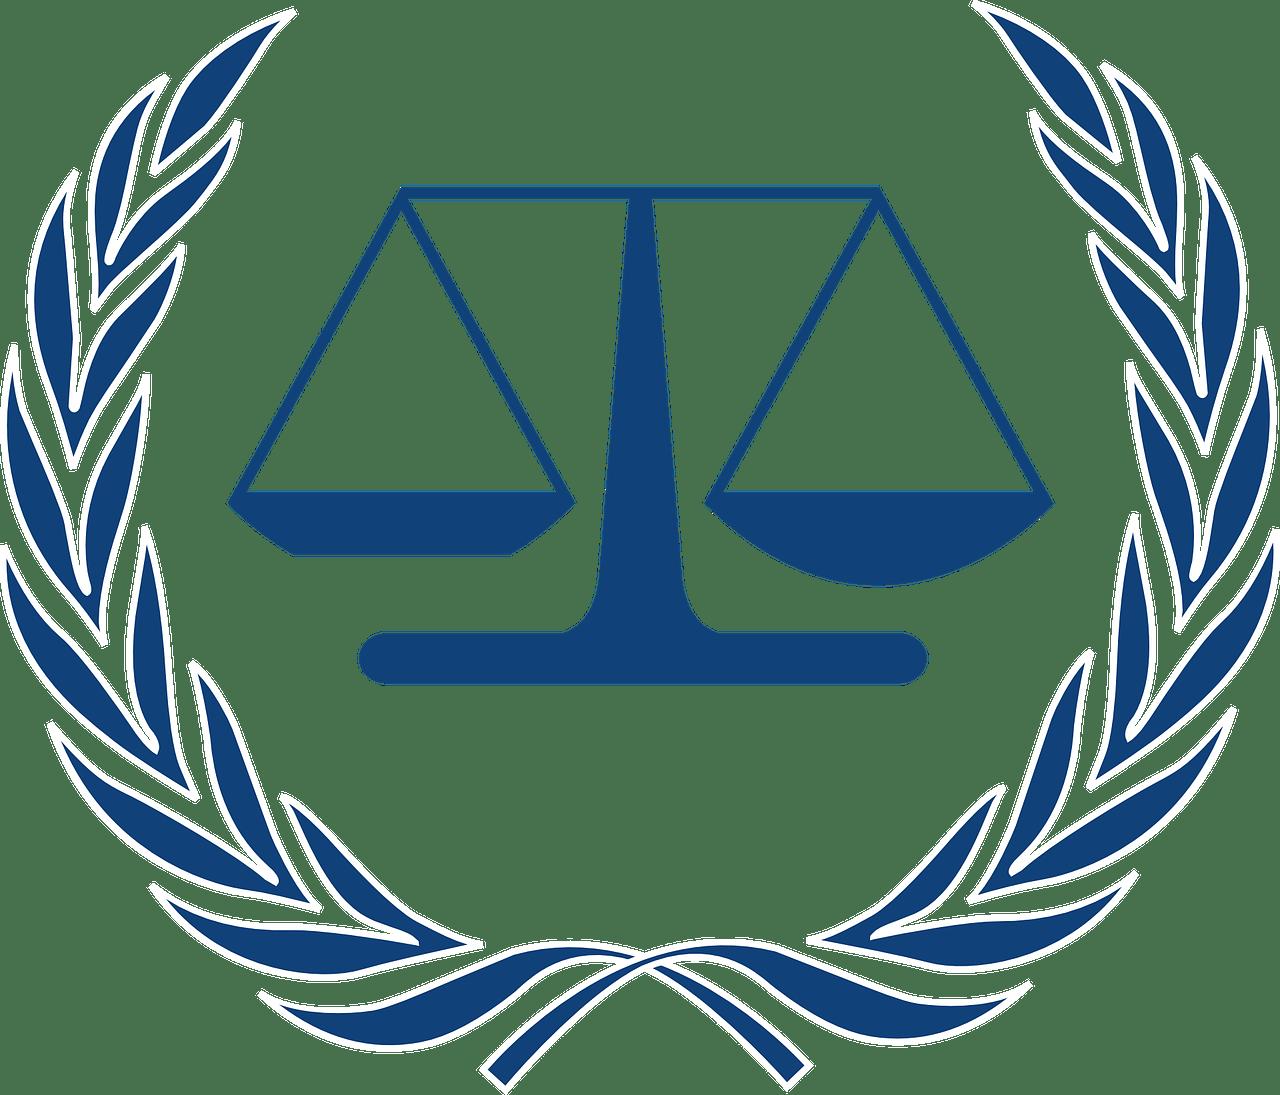 Вакансии РЖД в сфере юрисприденции